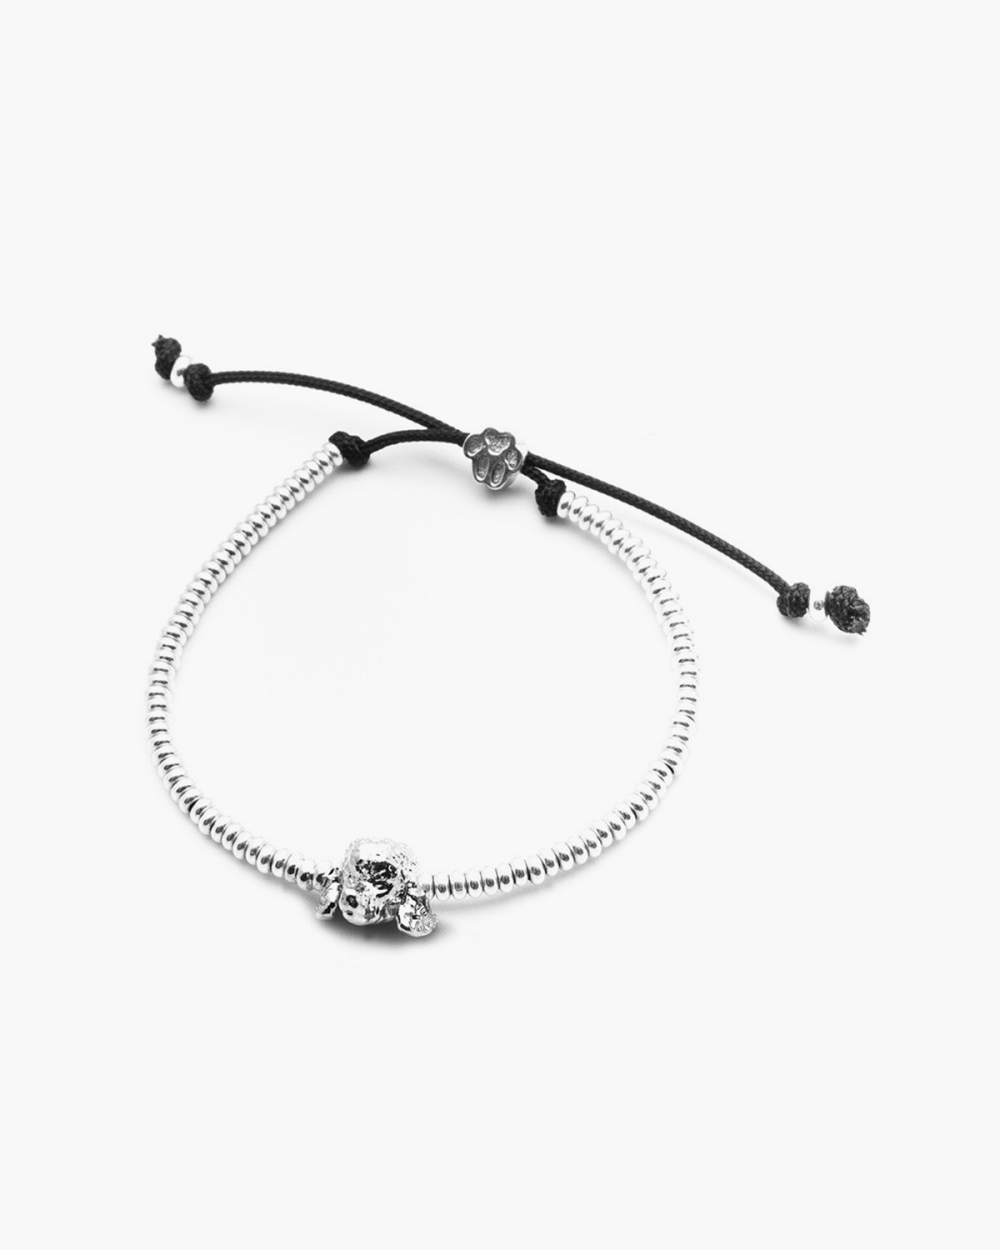 poodle snout bracelet polished silver